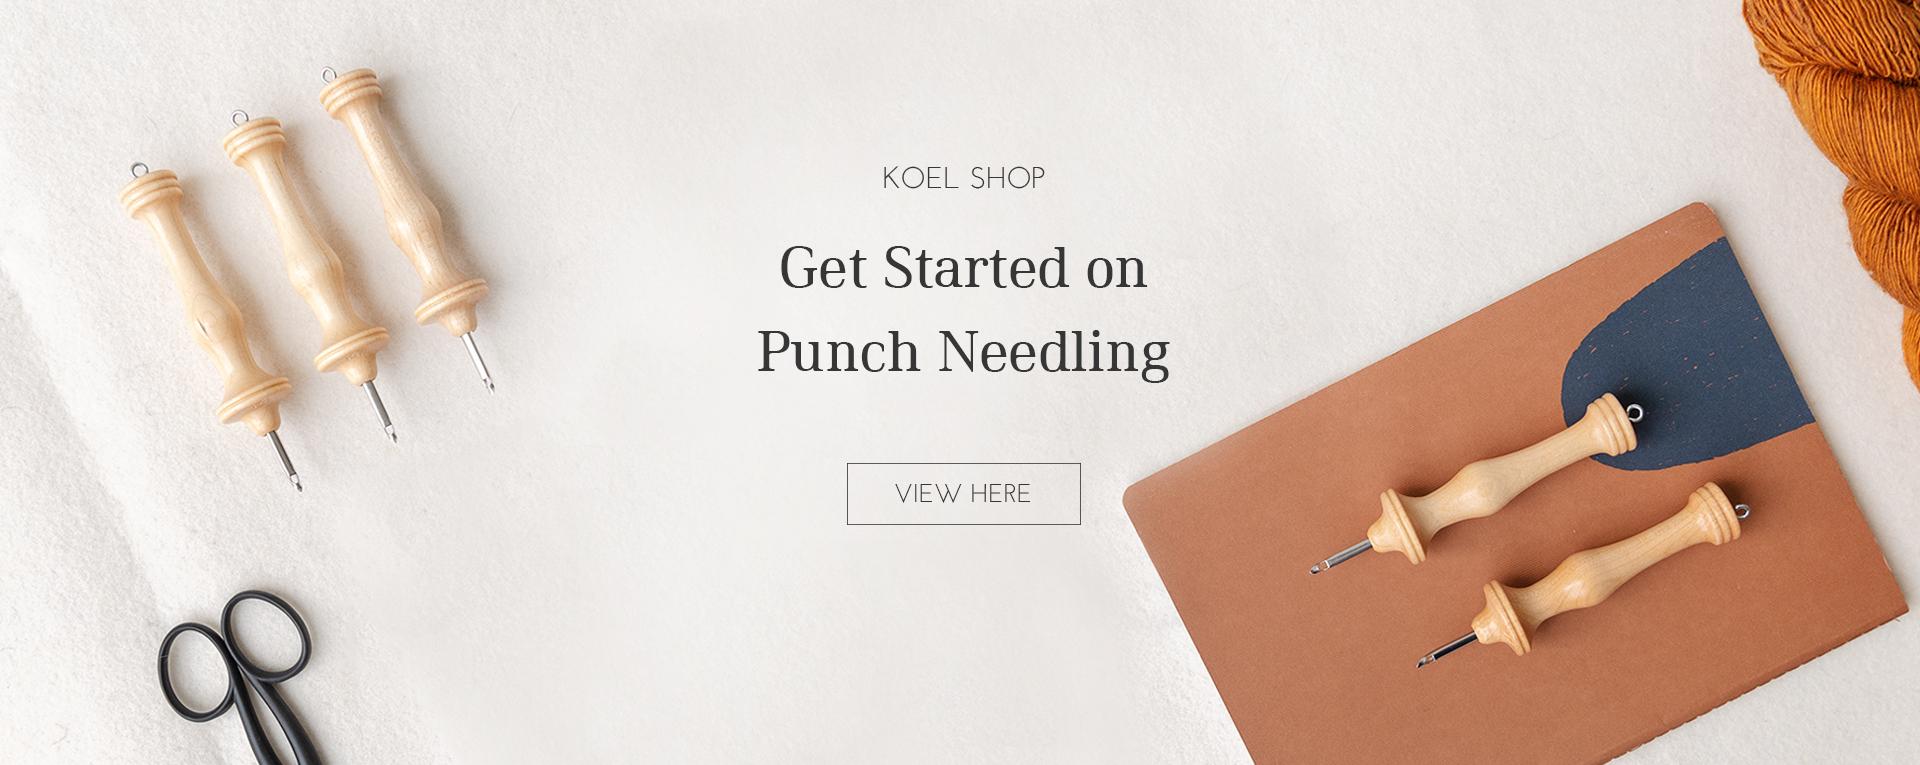 koel shop banner_punchneedle.jpg